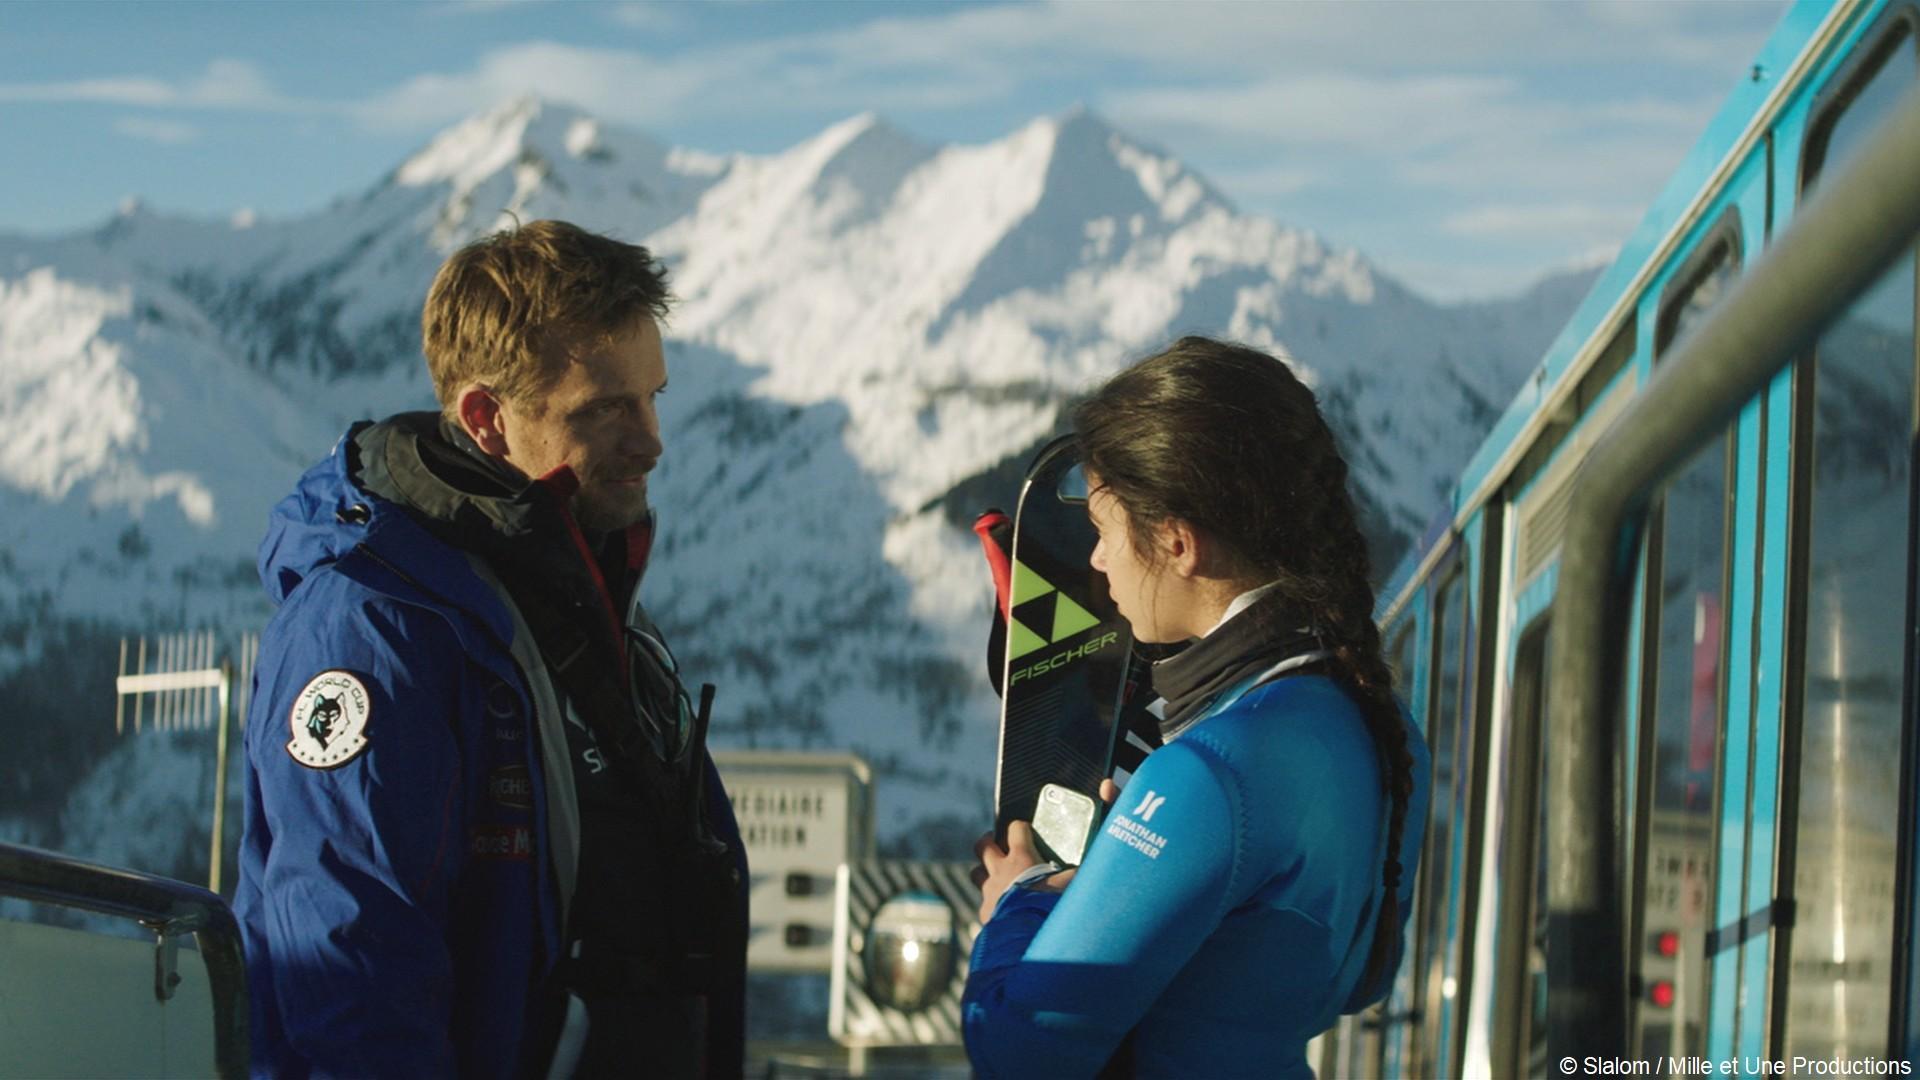 Film – Slalom (2020) (3)